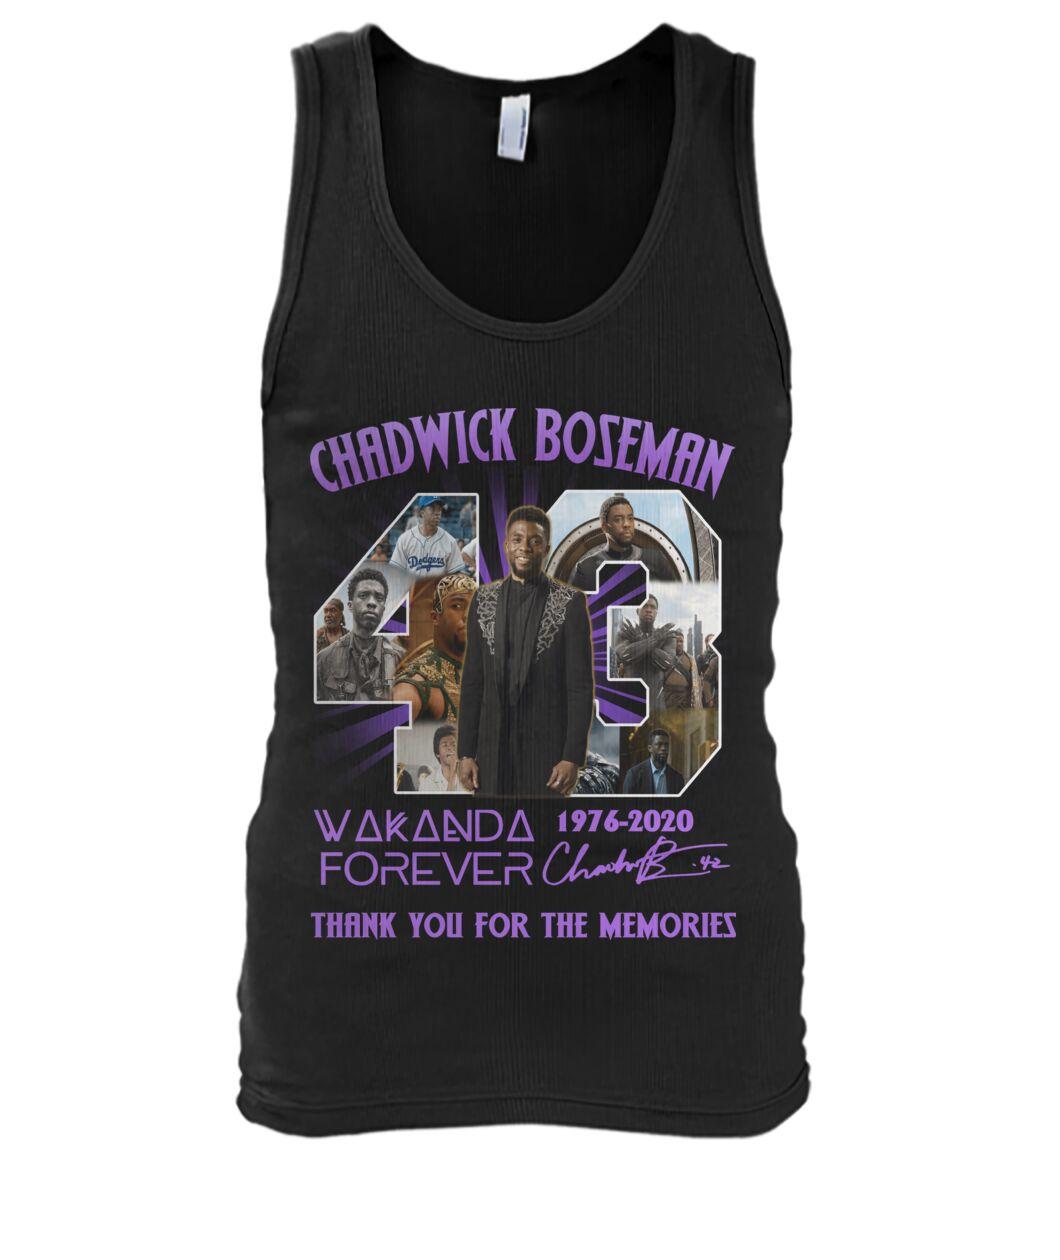 Chadwick Boseman Wakanda Forever Memories Tank top